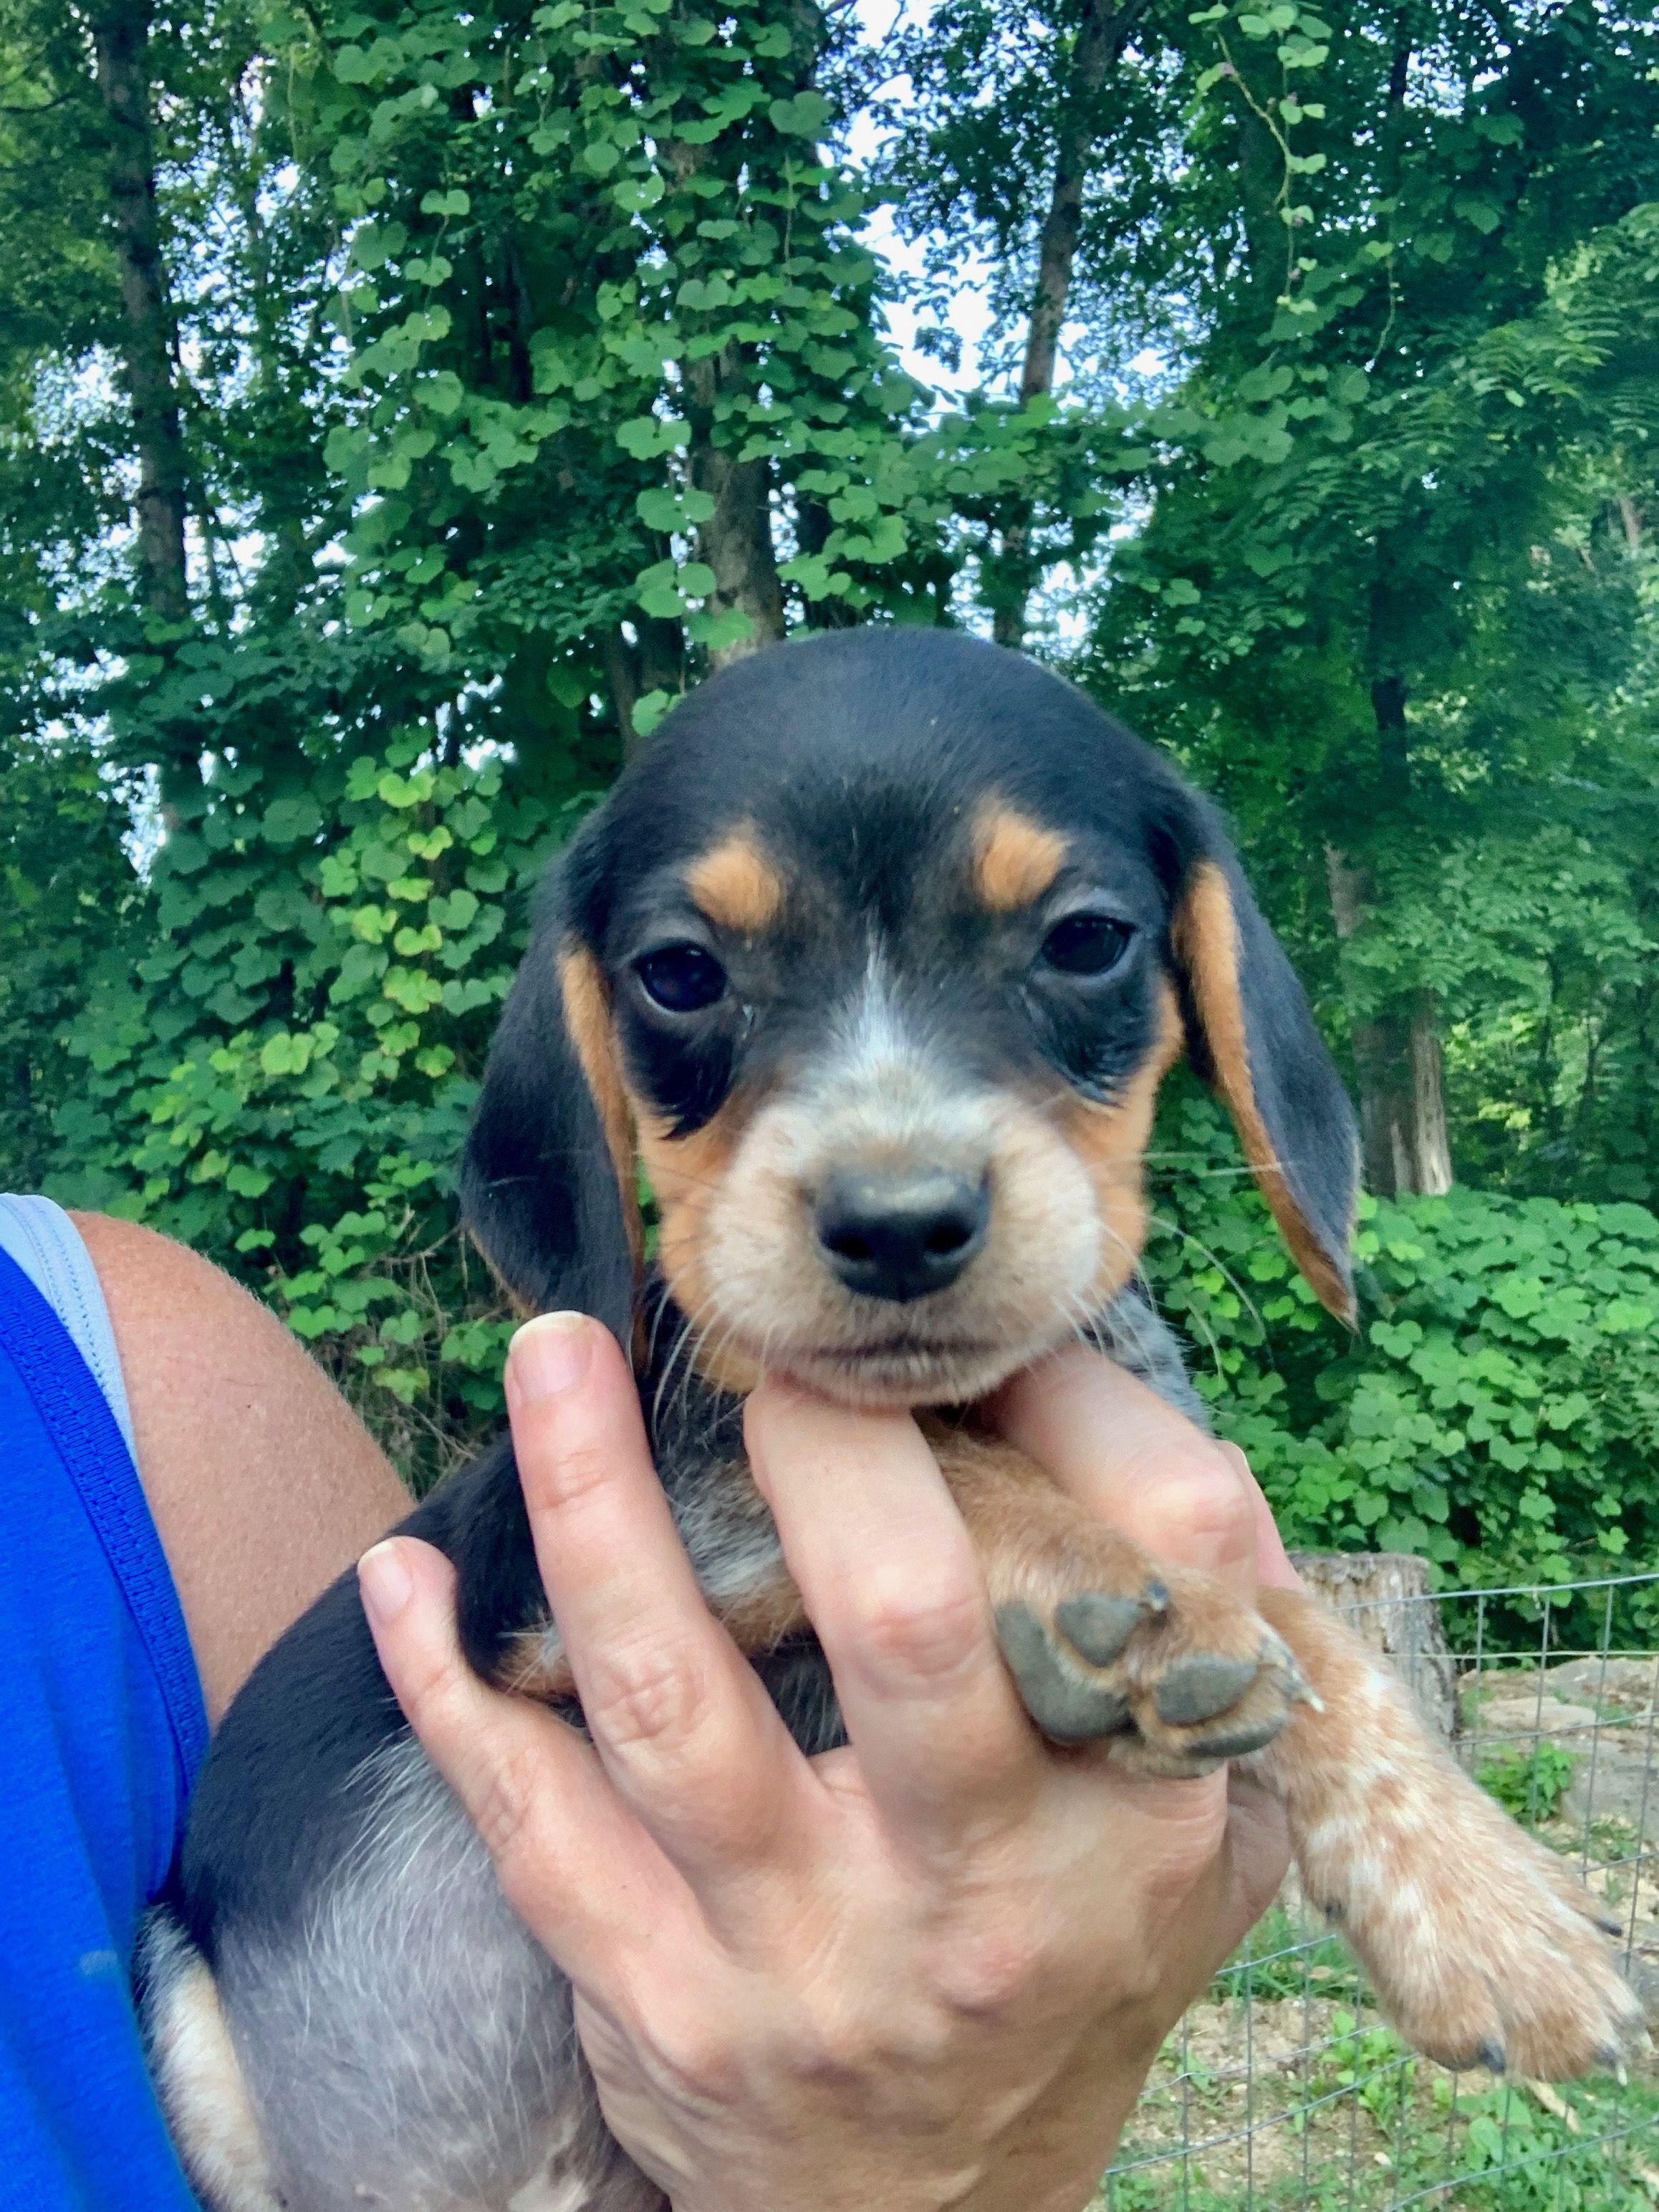 Breed Beagle Gender Male Registry Akc Personality Playful Date